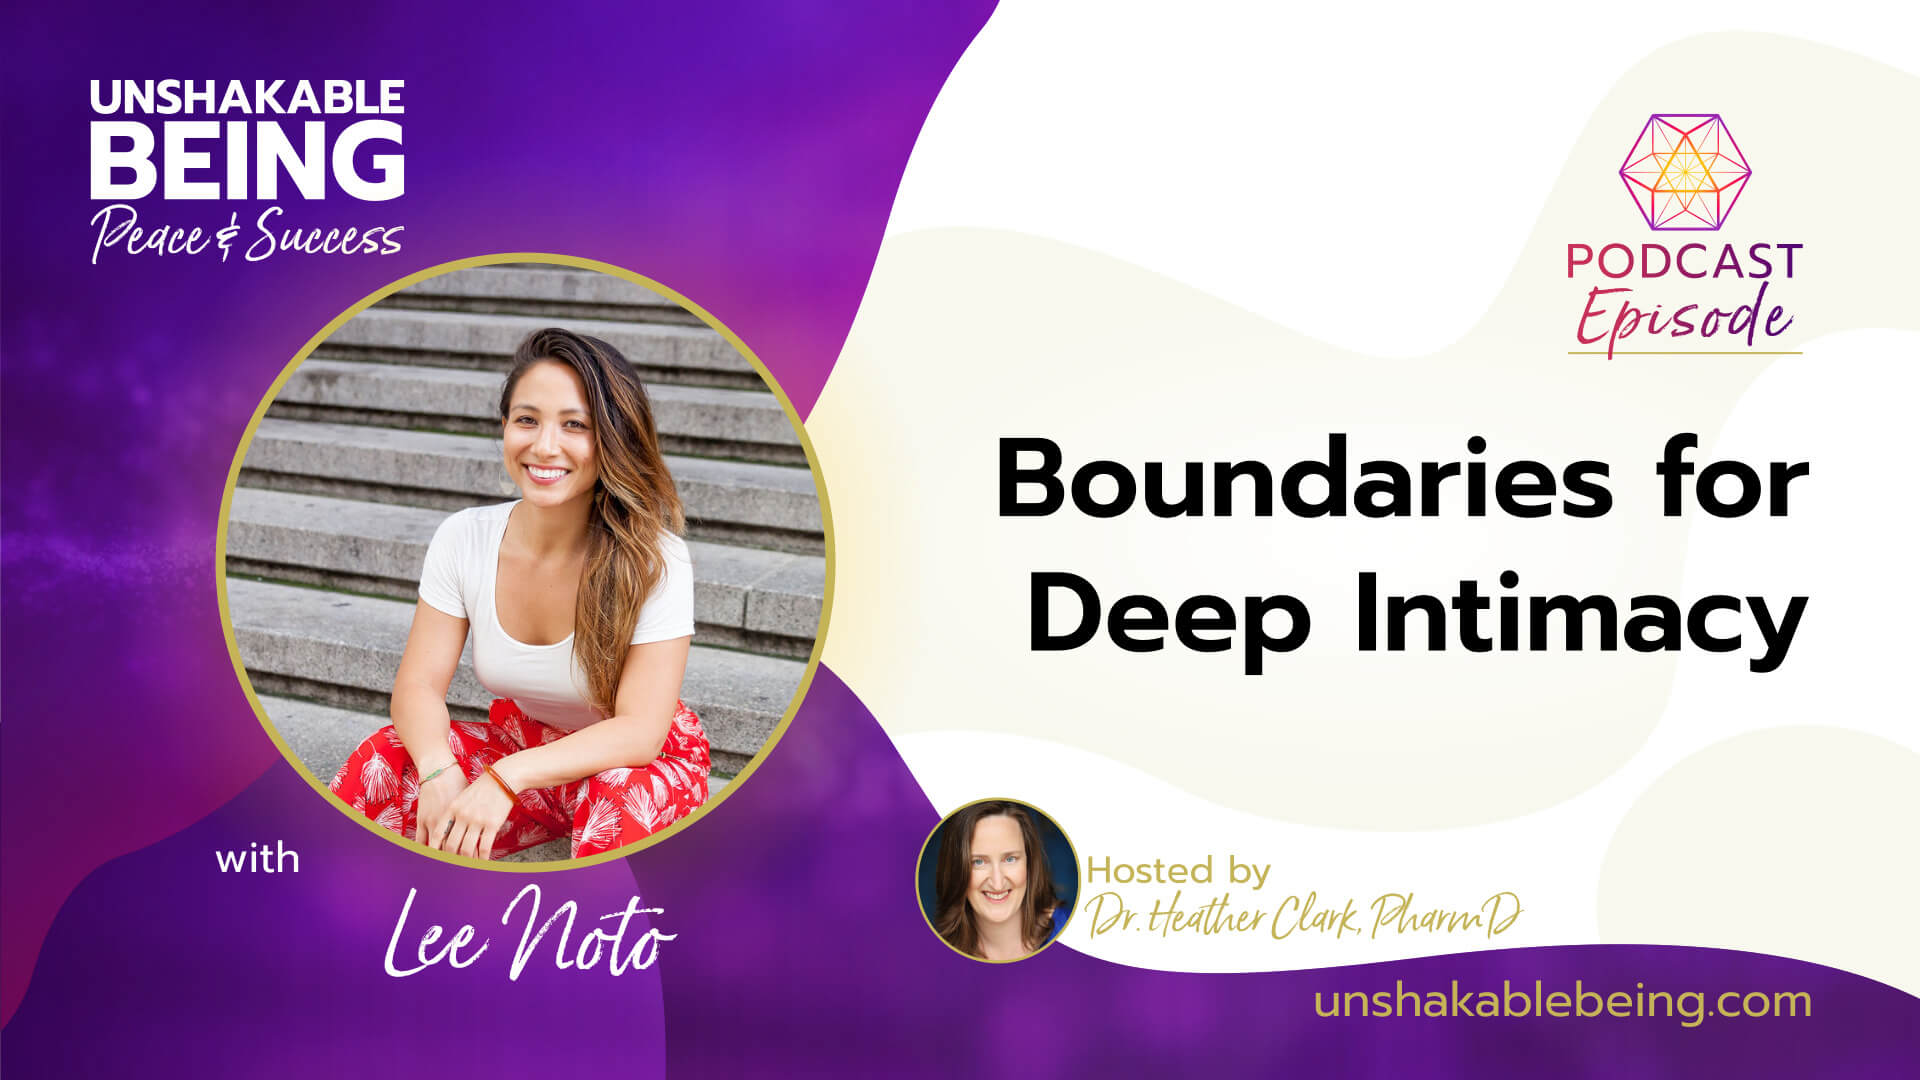 Boundaries for Deep Intimacy | Lee Noto